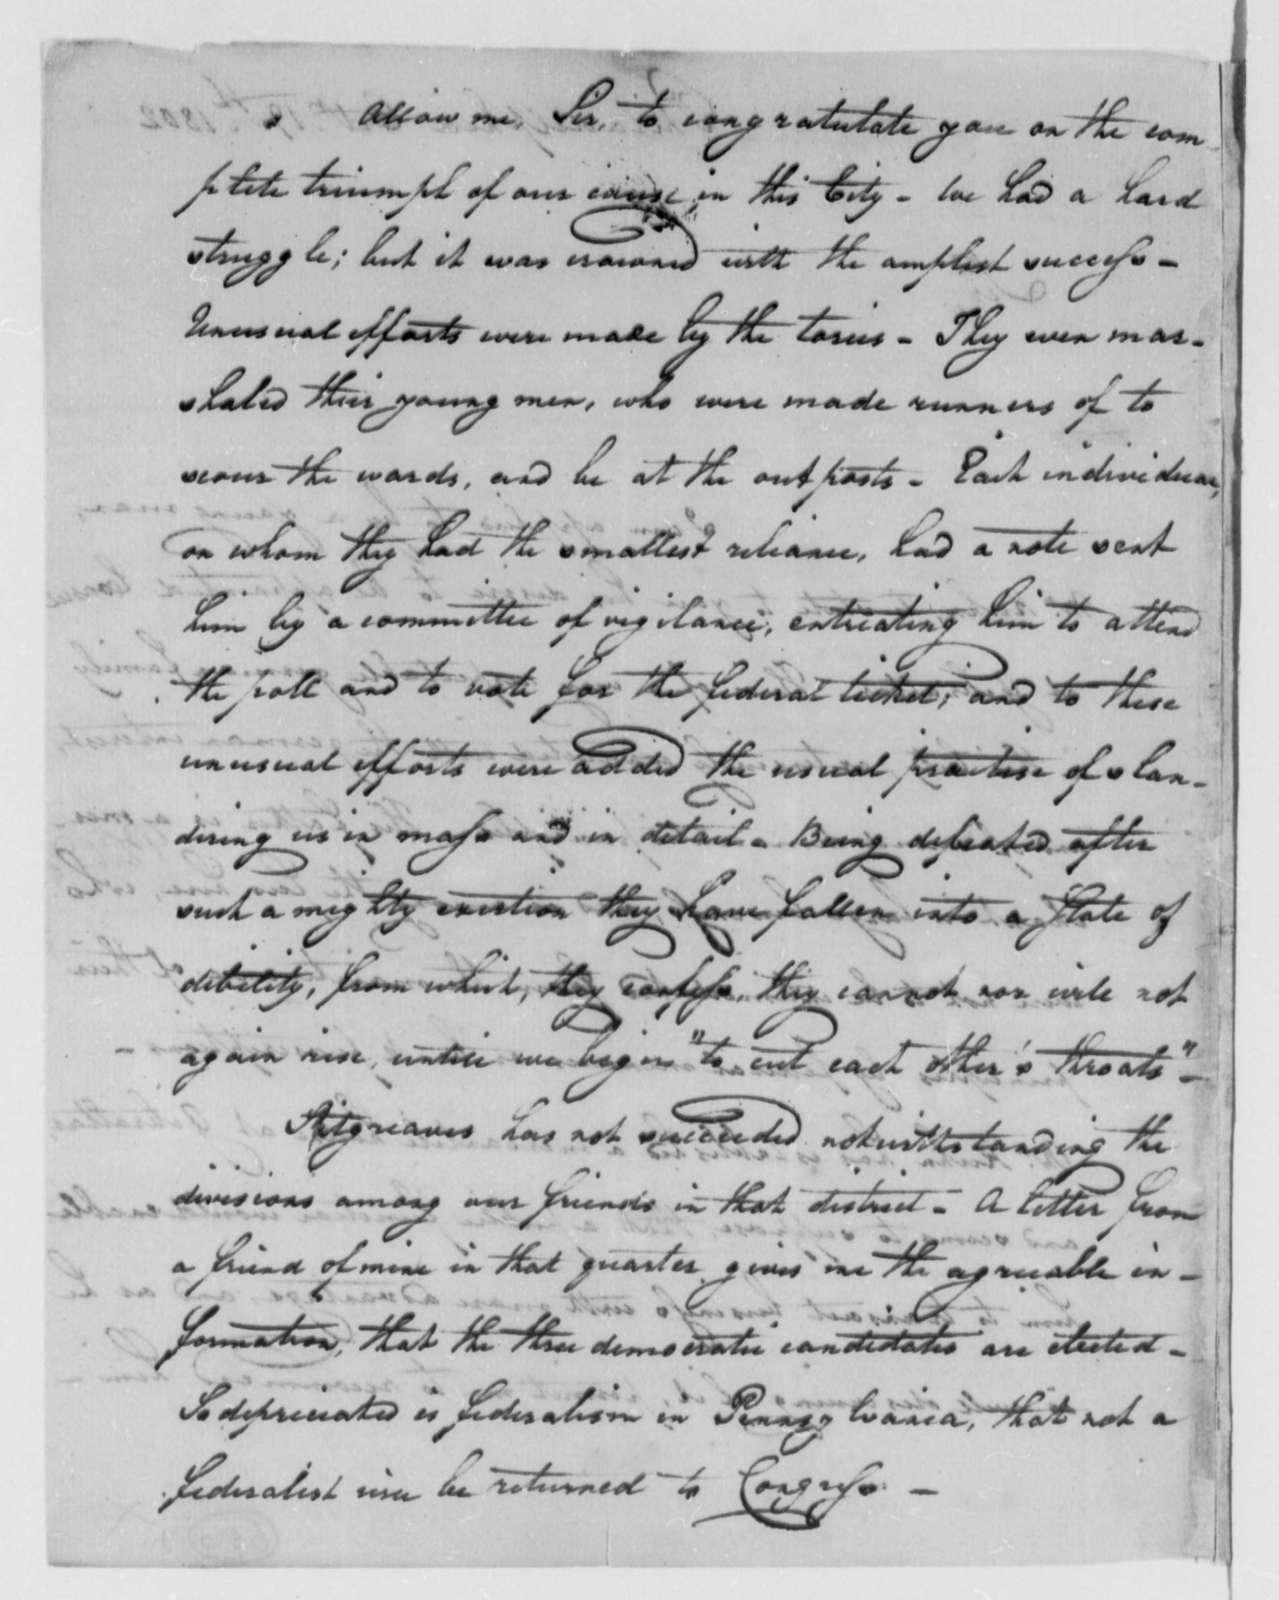 Michael Leib to Thomas Jefferson, October 19, 1802